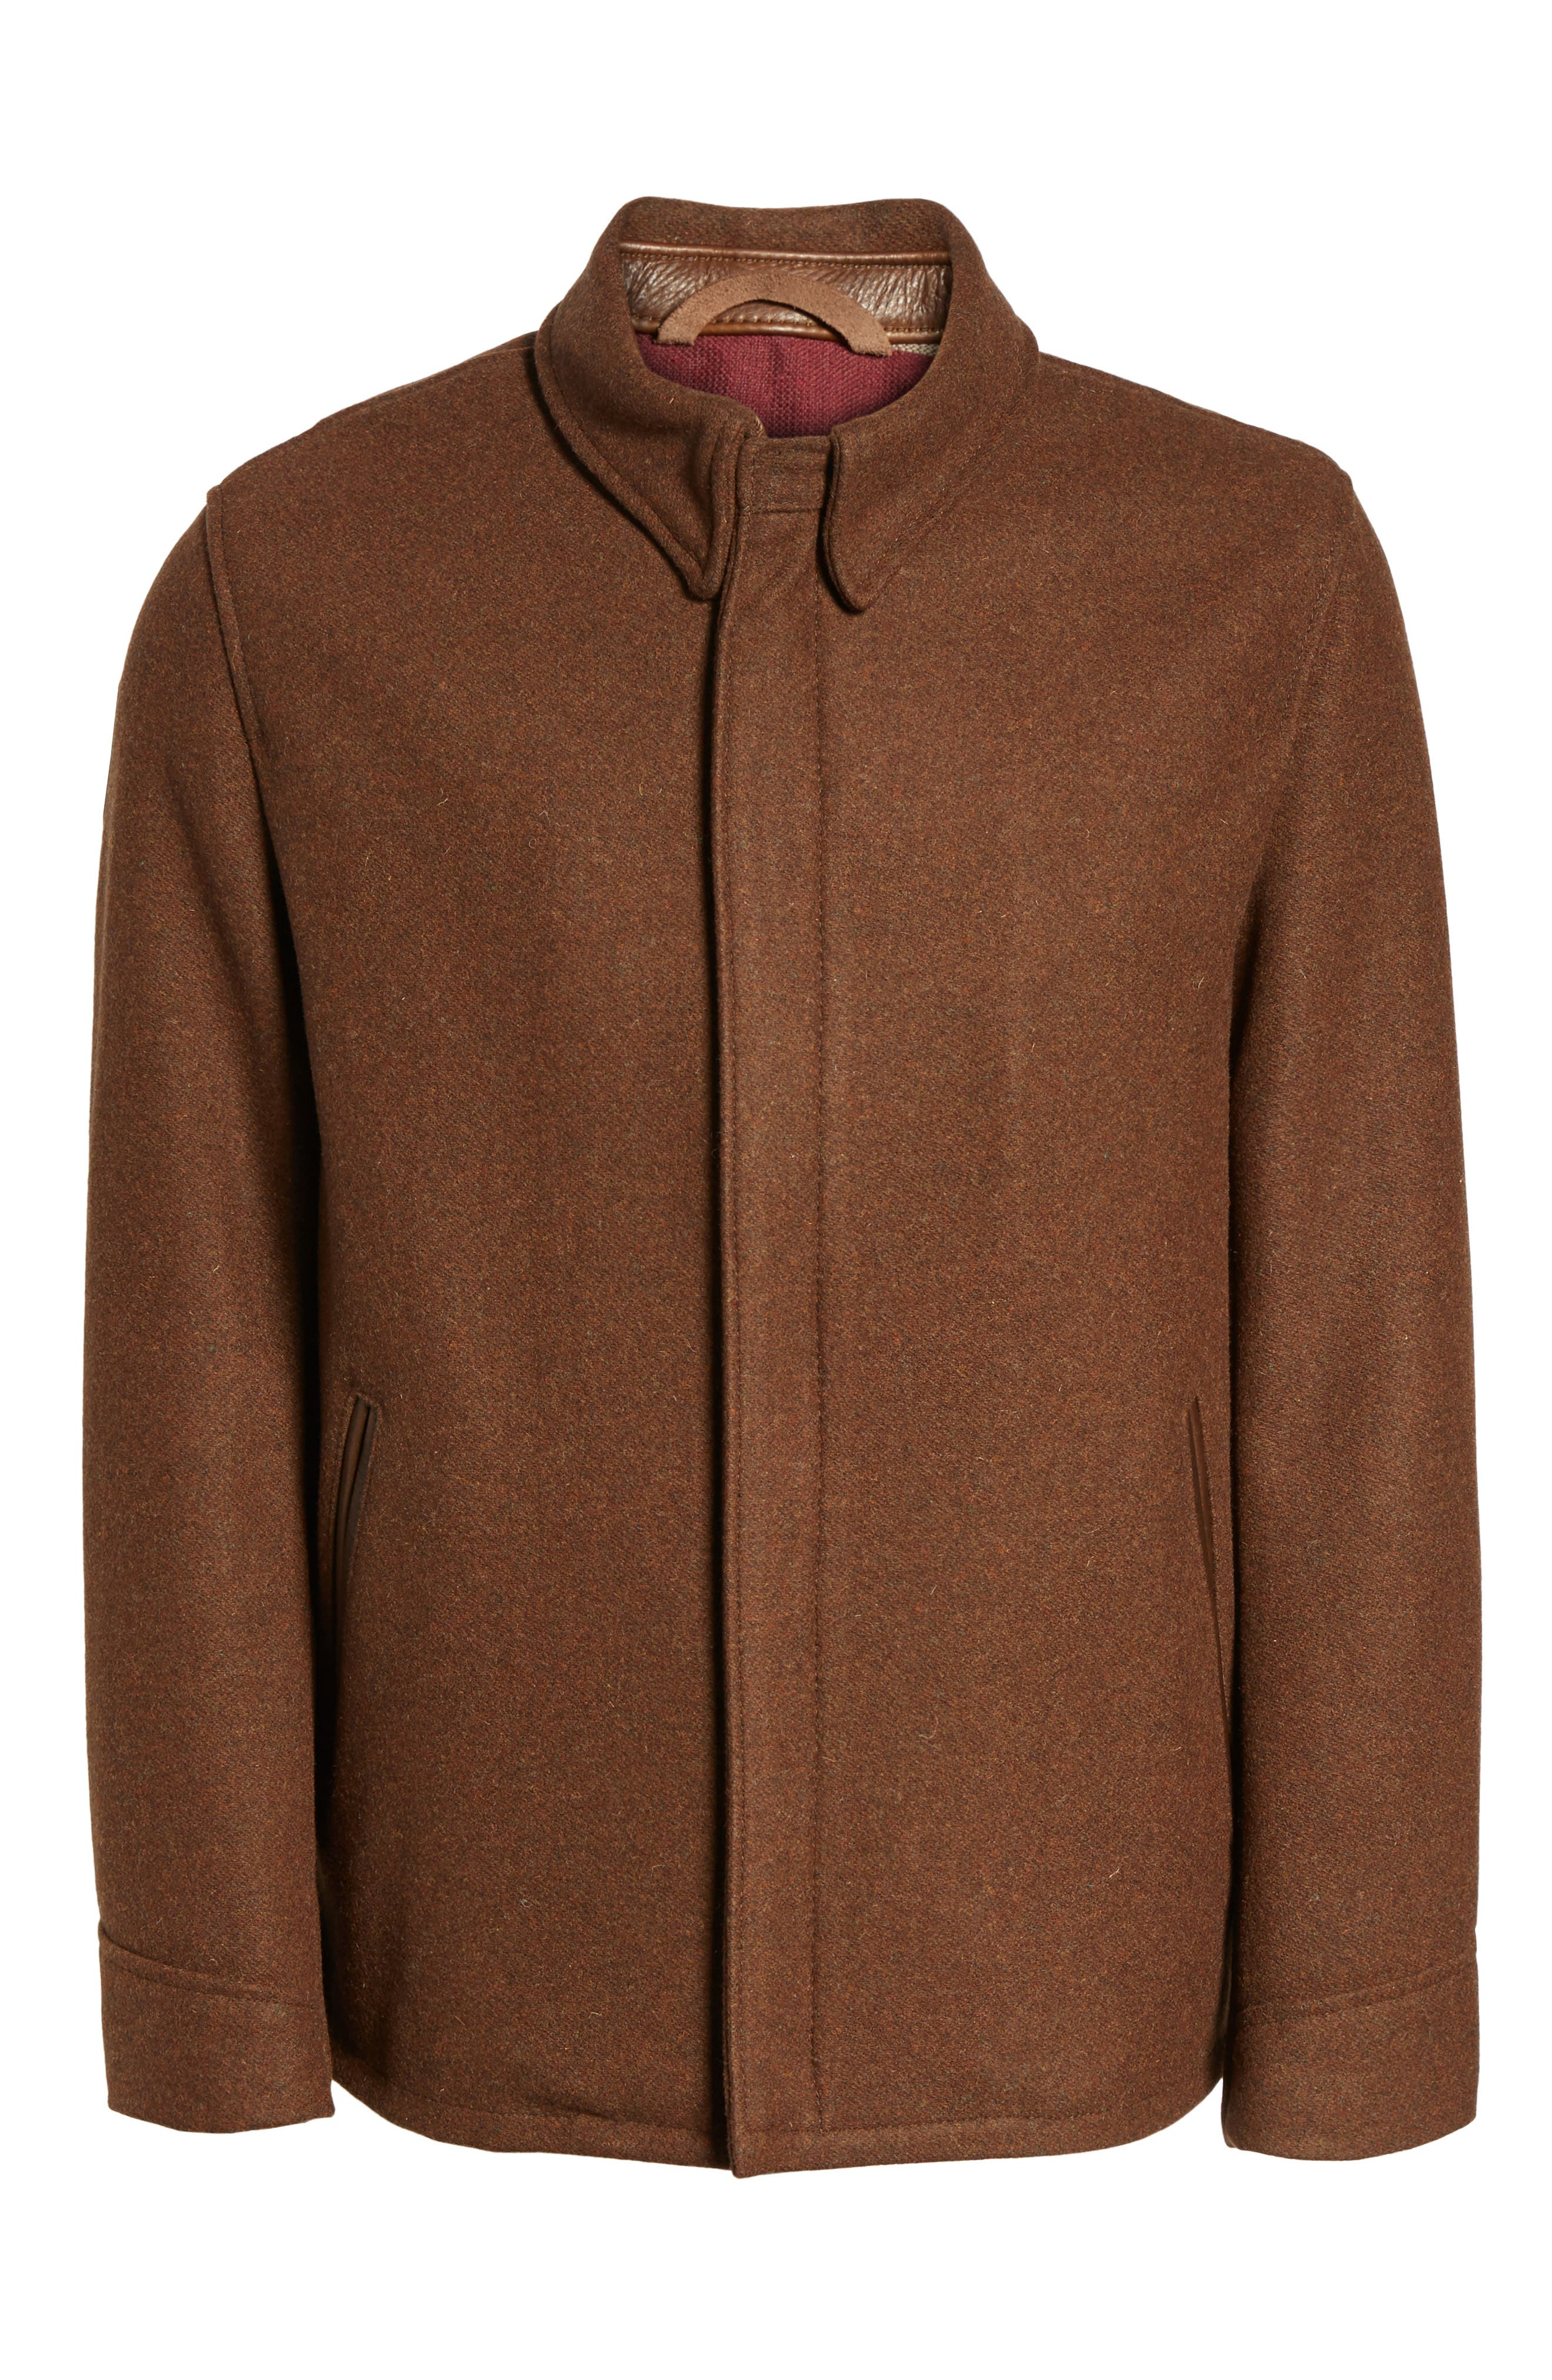 Liberty Wool Blend Zip Front Jacket,                             Alternate thumbnail 6, color,                             Brown